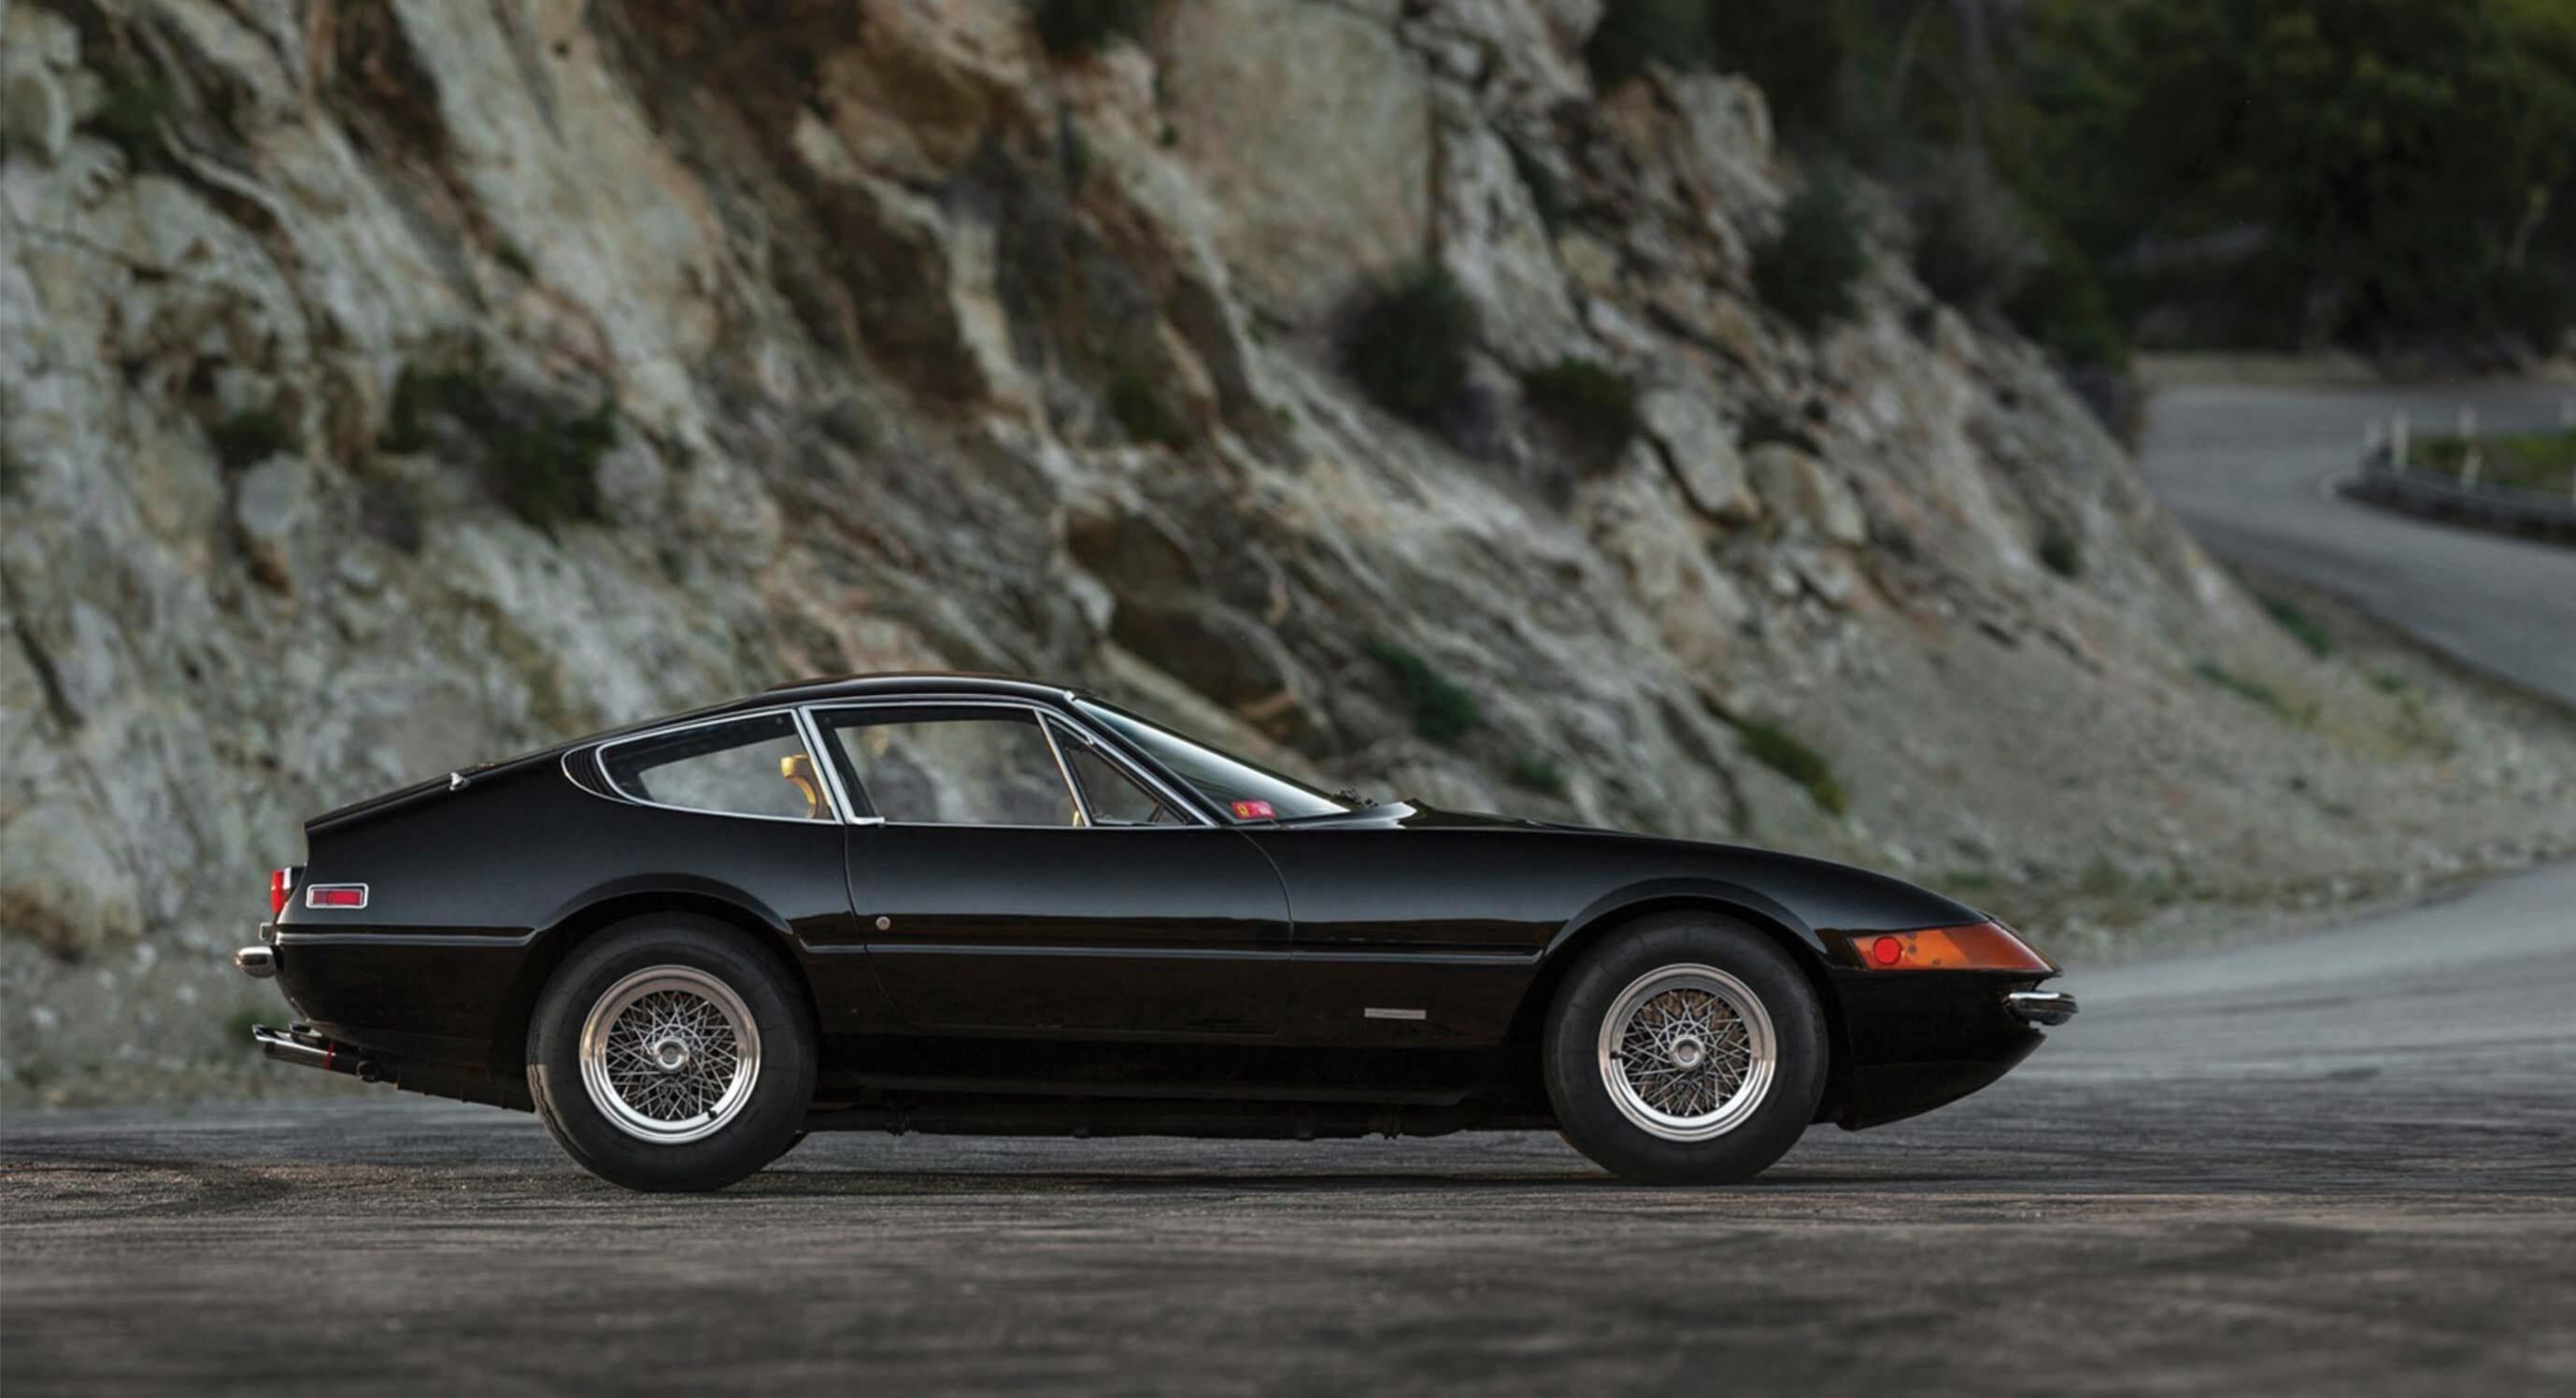 This 1971 Ferrari 365 GTB/4 Is A True Italian Masterpiece